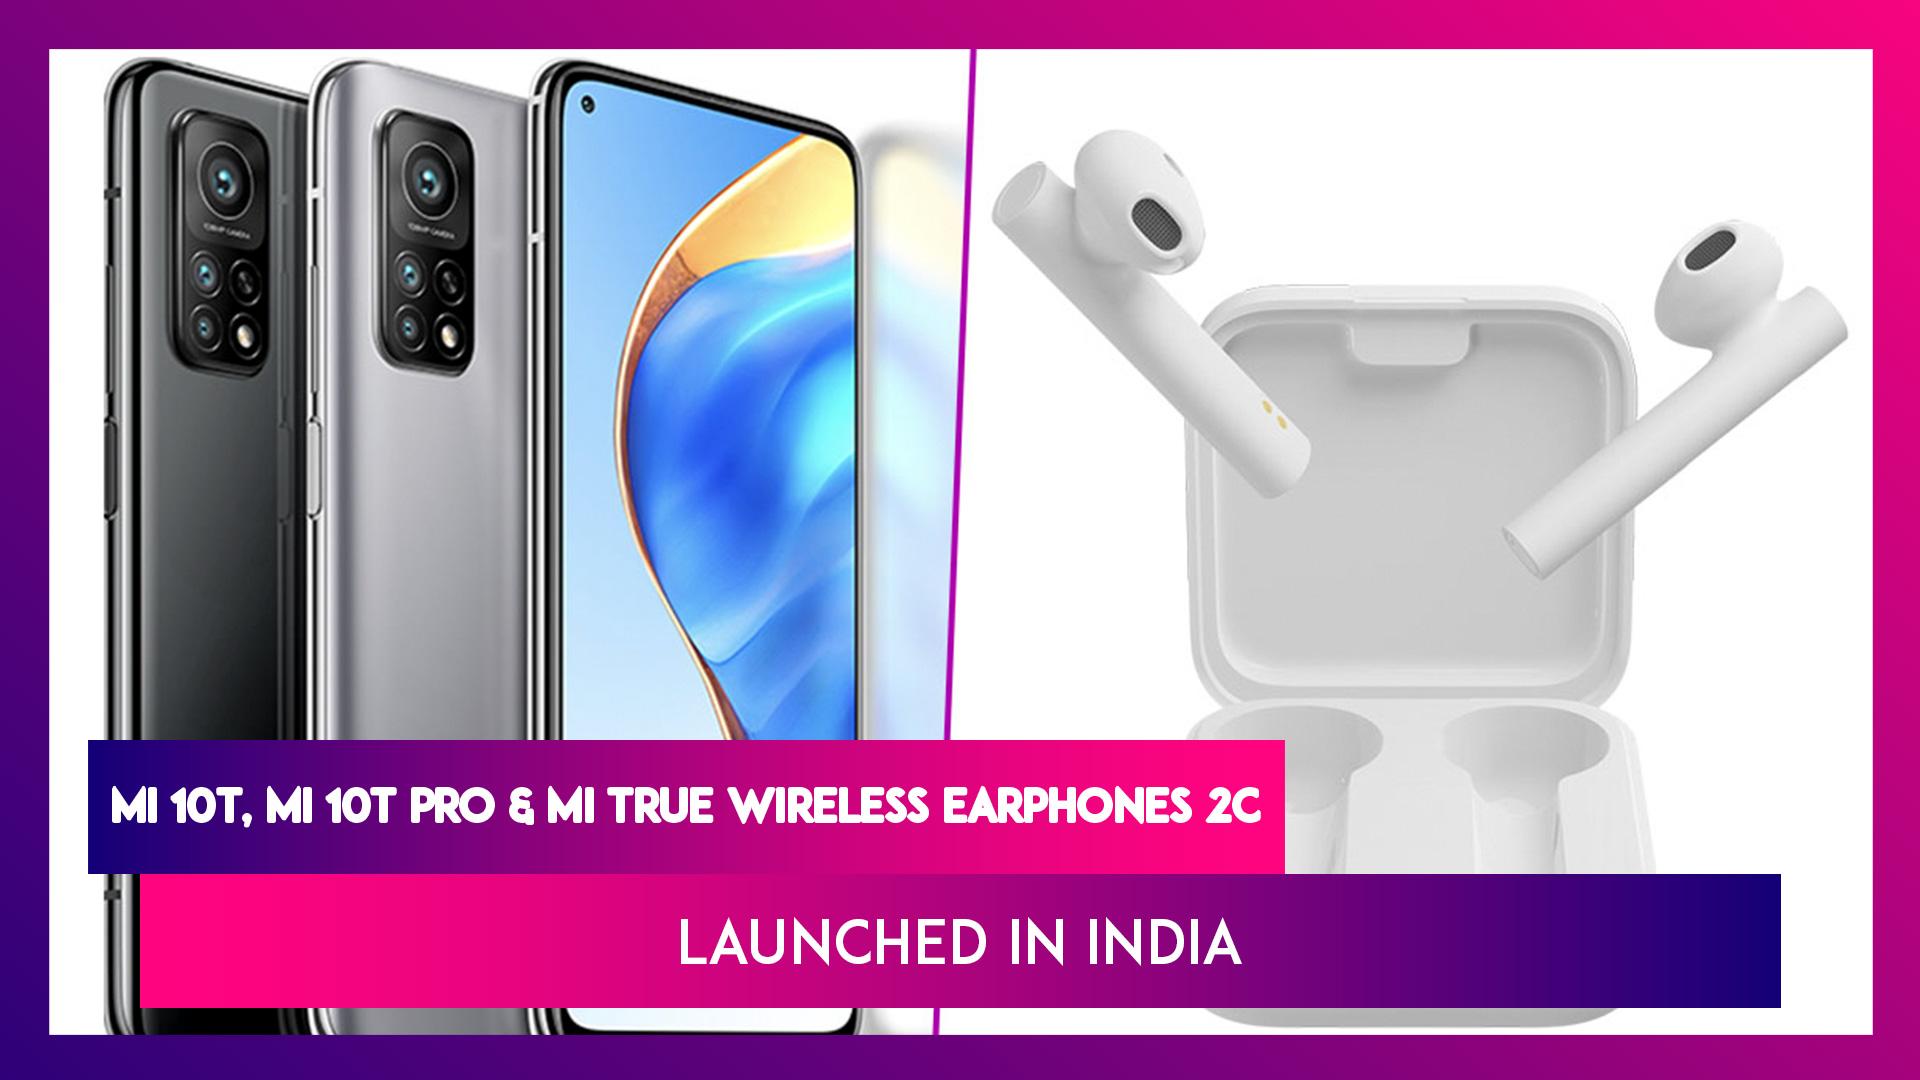 Xiaomi Mi 10T Series & Mi True Wireless Earphones 2C Launched In India; Prices, Features, Variants & Specifications